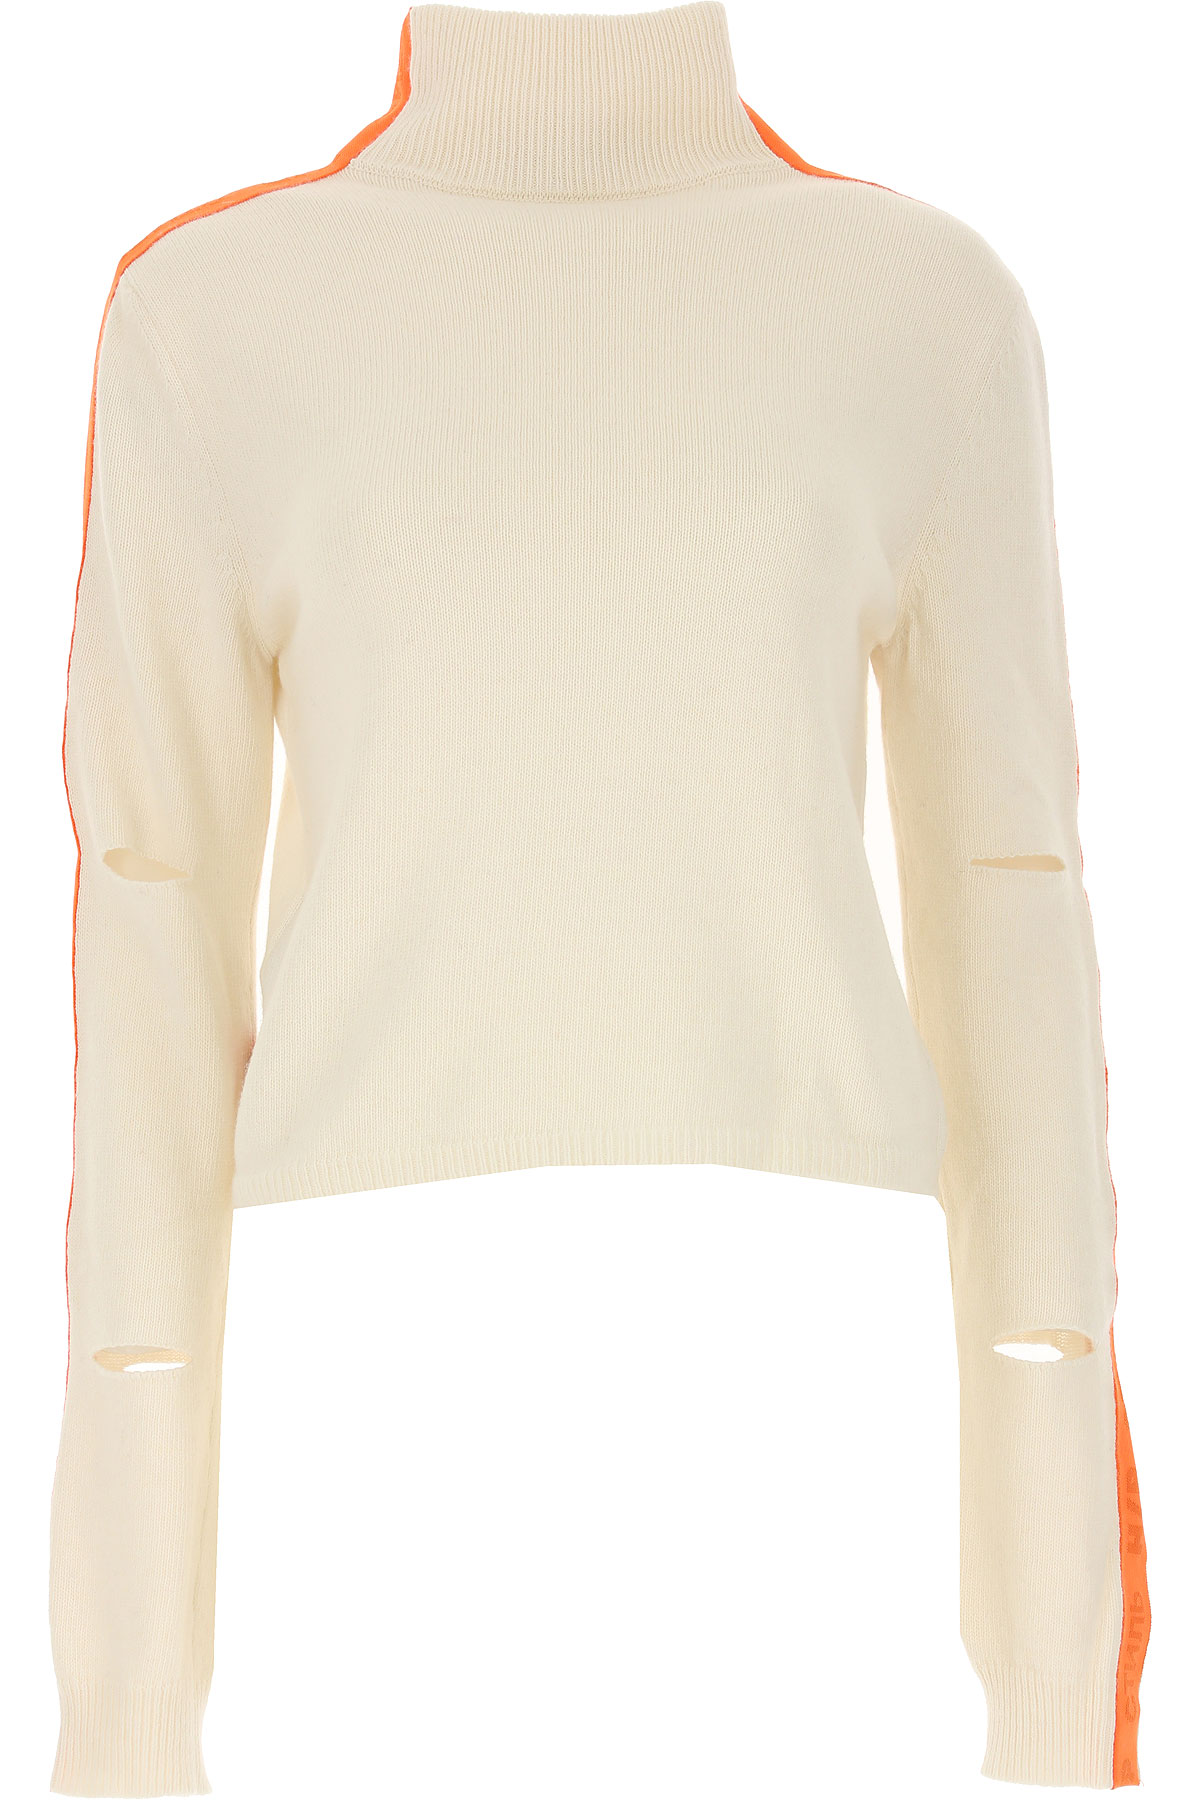 Image of Heron Preston Sweater for Women Jumper, White, Extrafine Baby Merinos Wool, 2017, 2 4 6